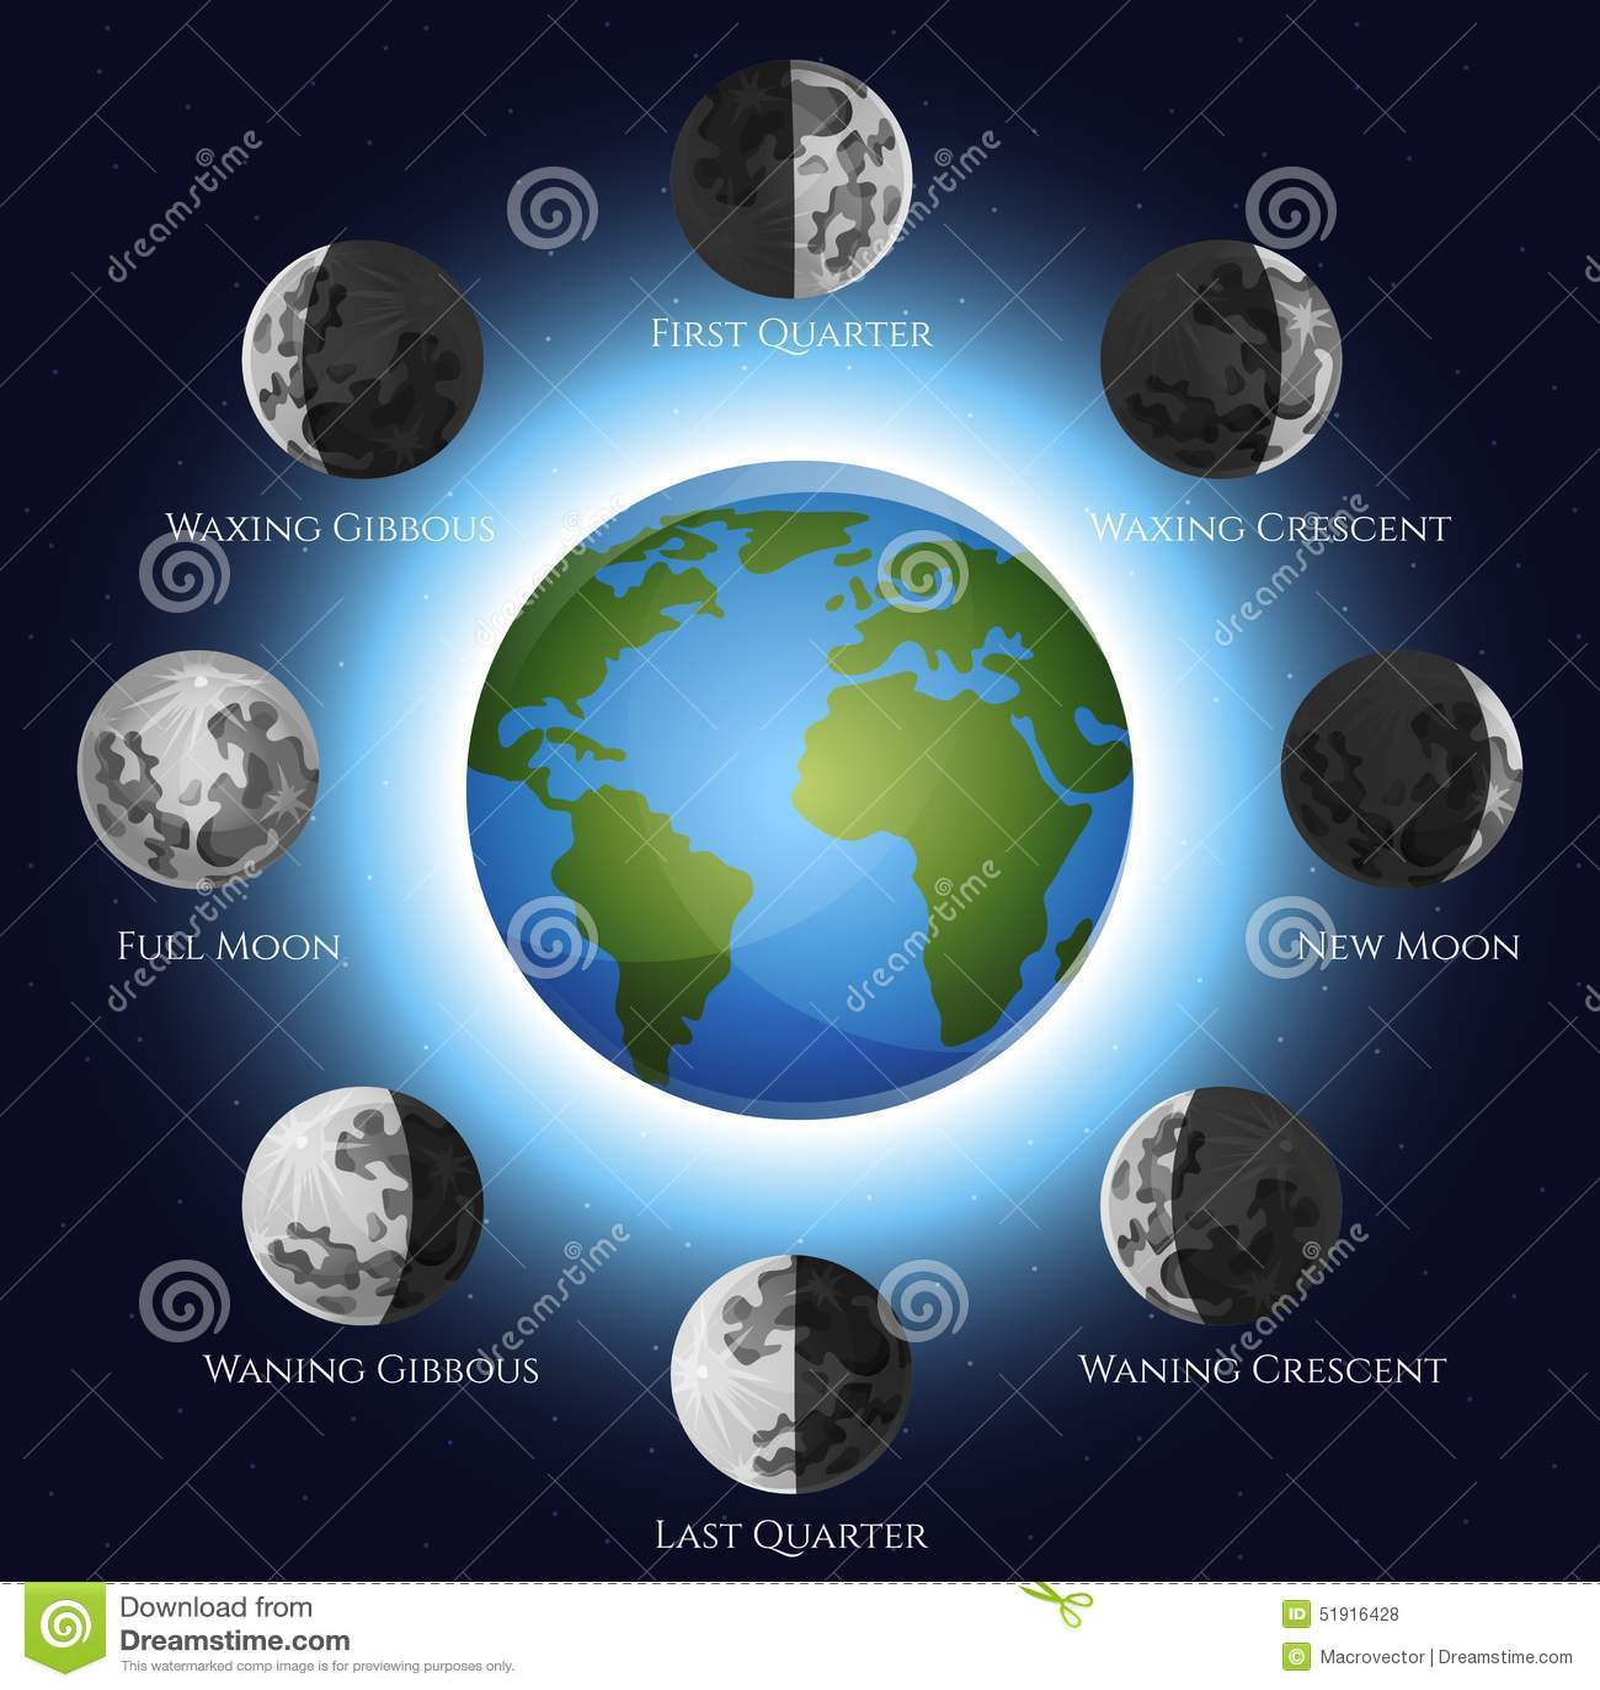 Moon Calendar Illustration : Moon phases illustration stock vector of